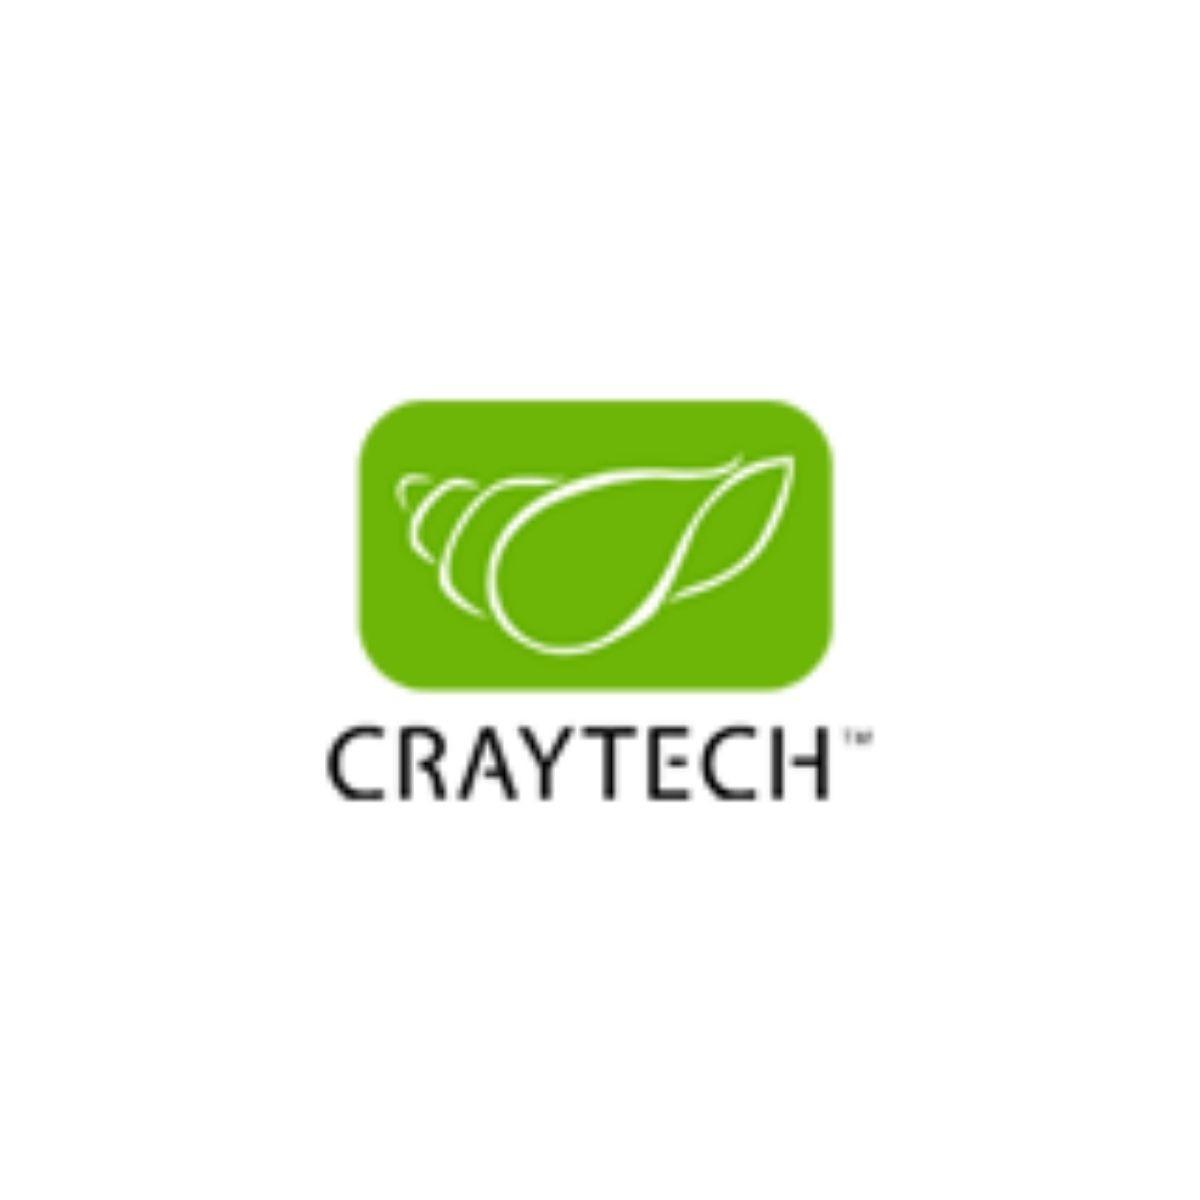 Craytech